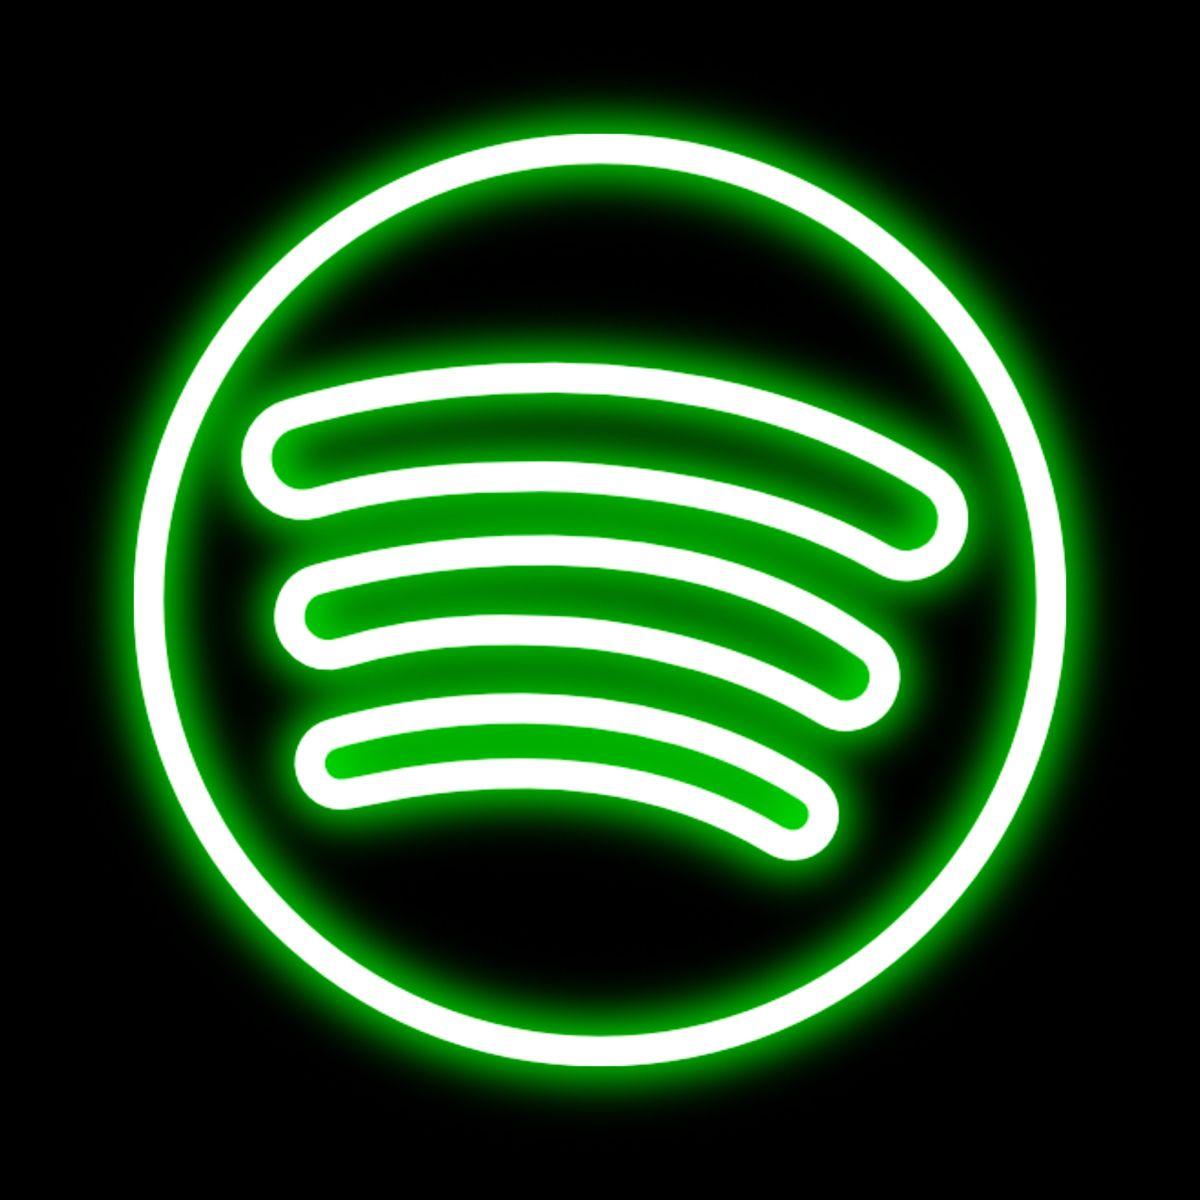 Spotify neon icon